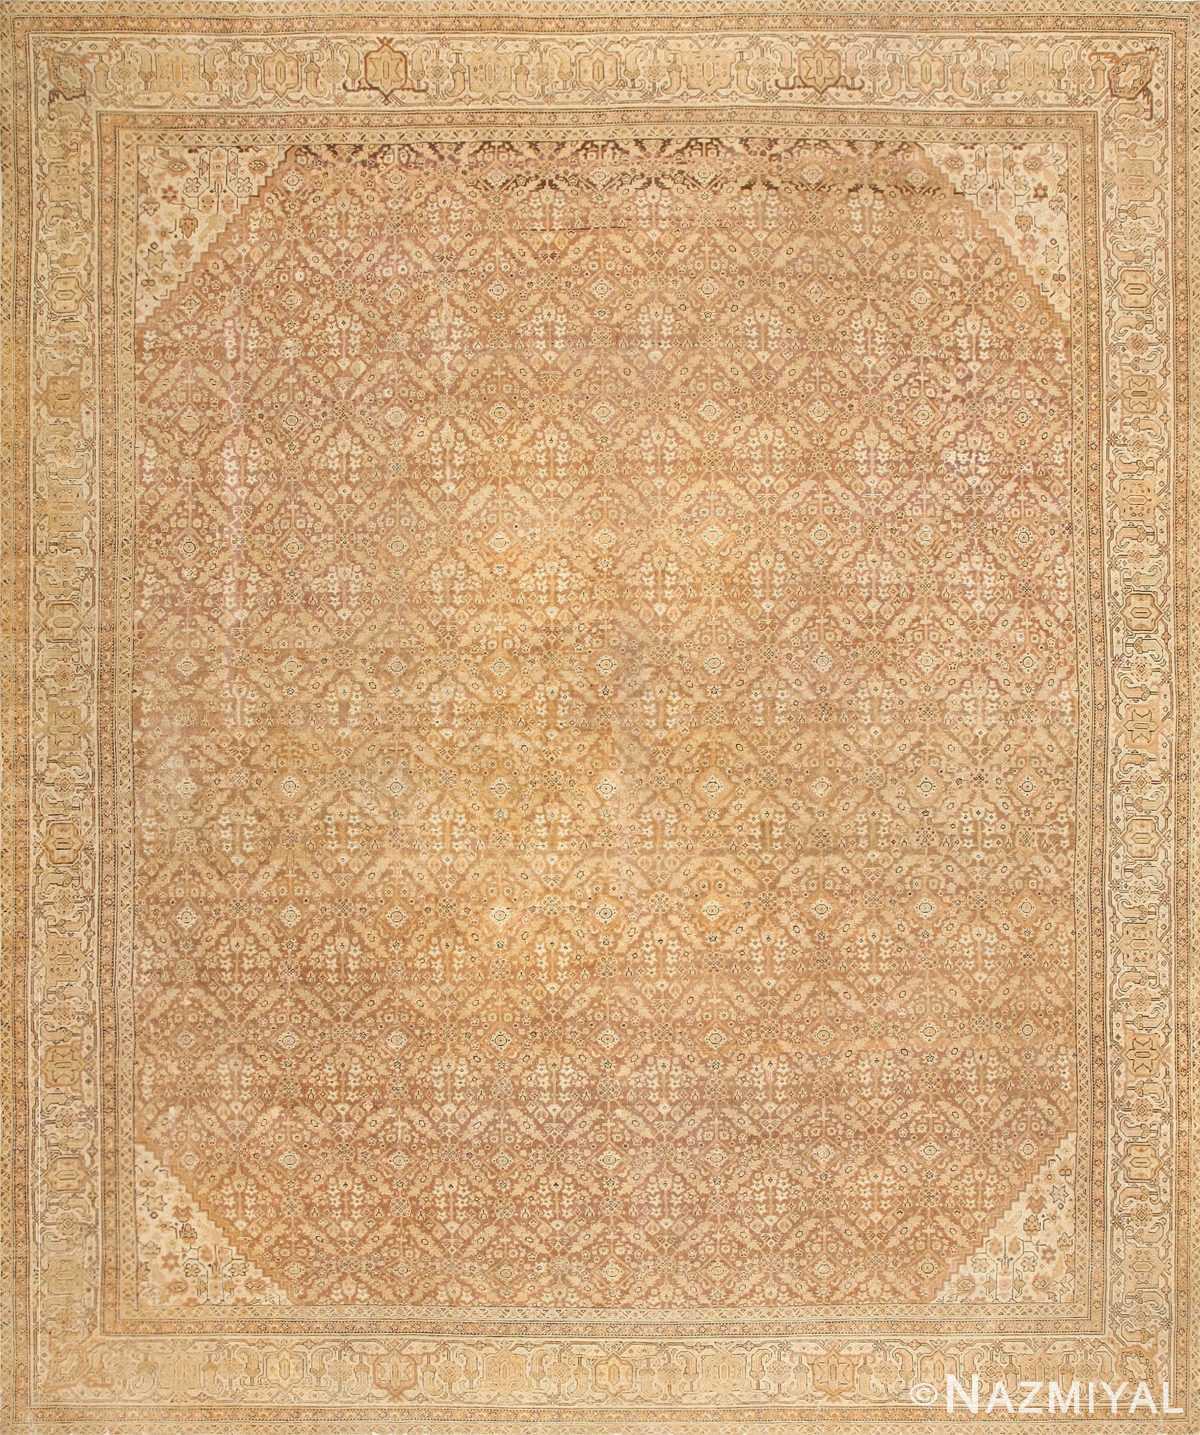 Antique Indian Amritsar Rug 50455 Detail/Large View